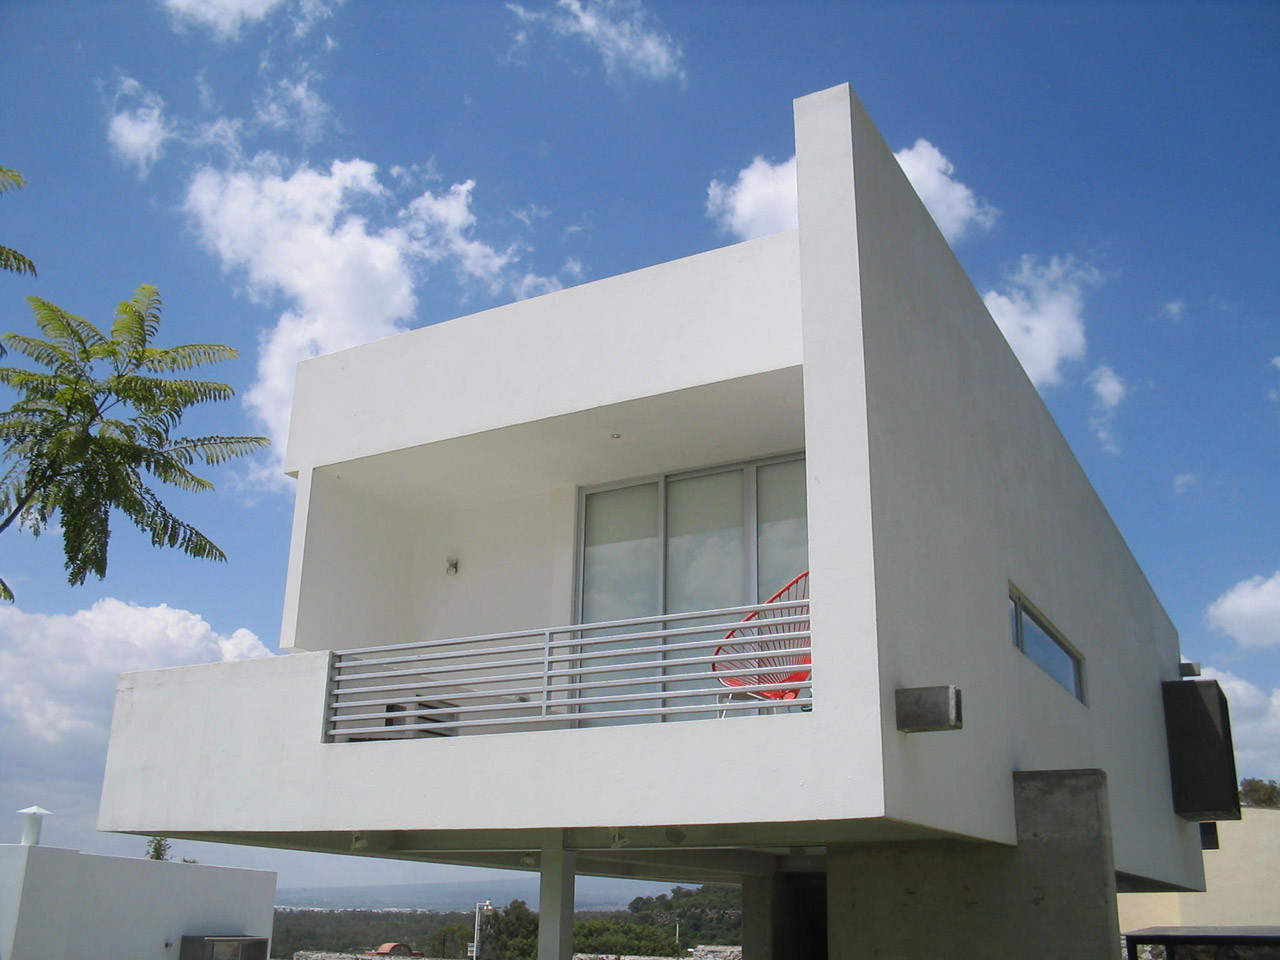 Flat Issa / Dionne Arquitectos, © Fred Dionne